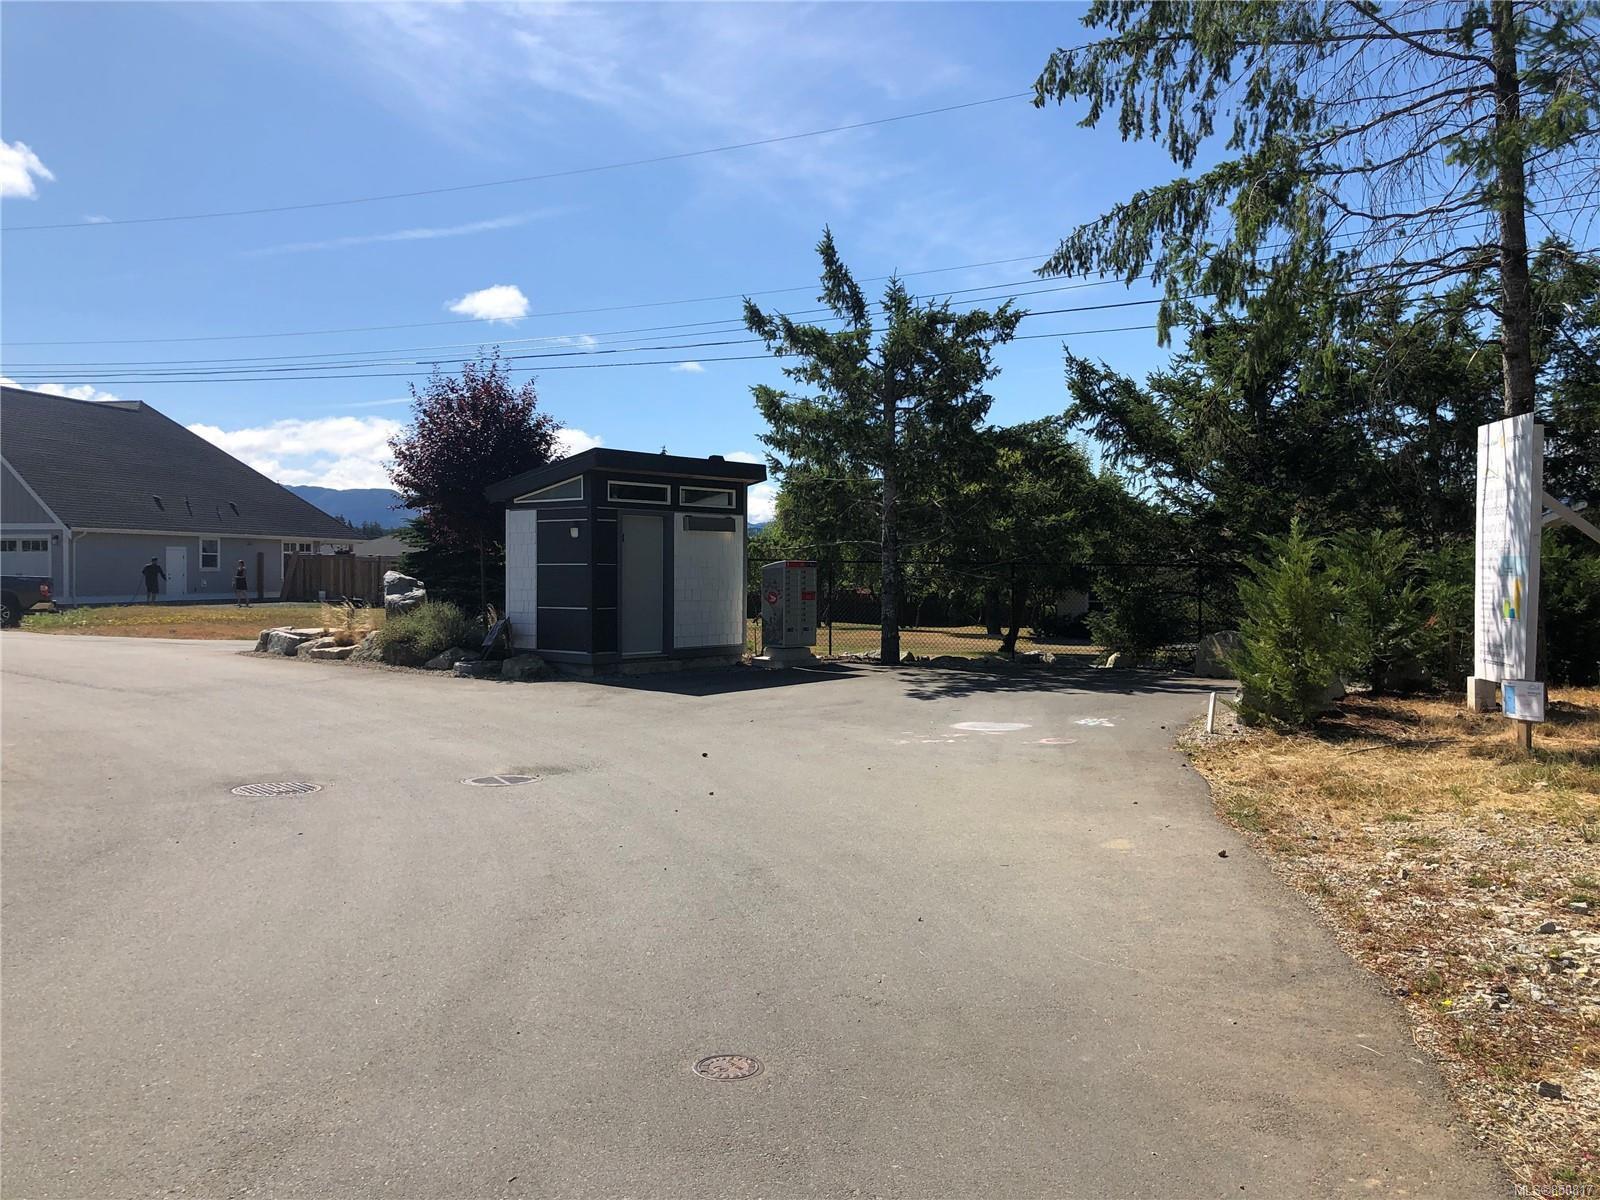 Photo 5: Photos: 108 4065 McBride St in : PA Port Alberni Land for sale (Port Alberni)  : MLS®# 850817